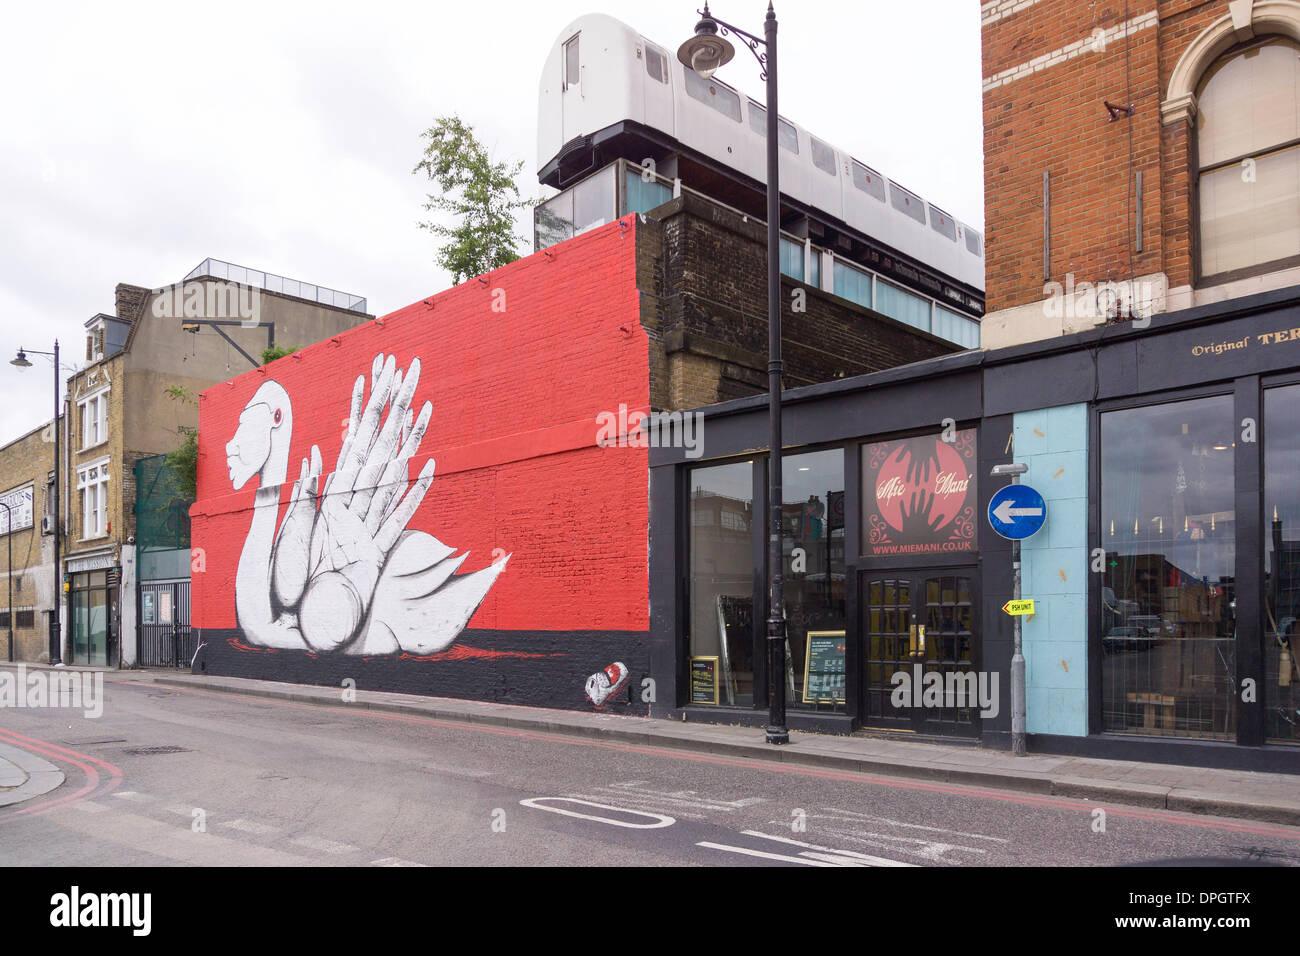 famous Graffiti art in the London district of Shoreditch, London, United Kingdom - June 2013 - Stock Image